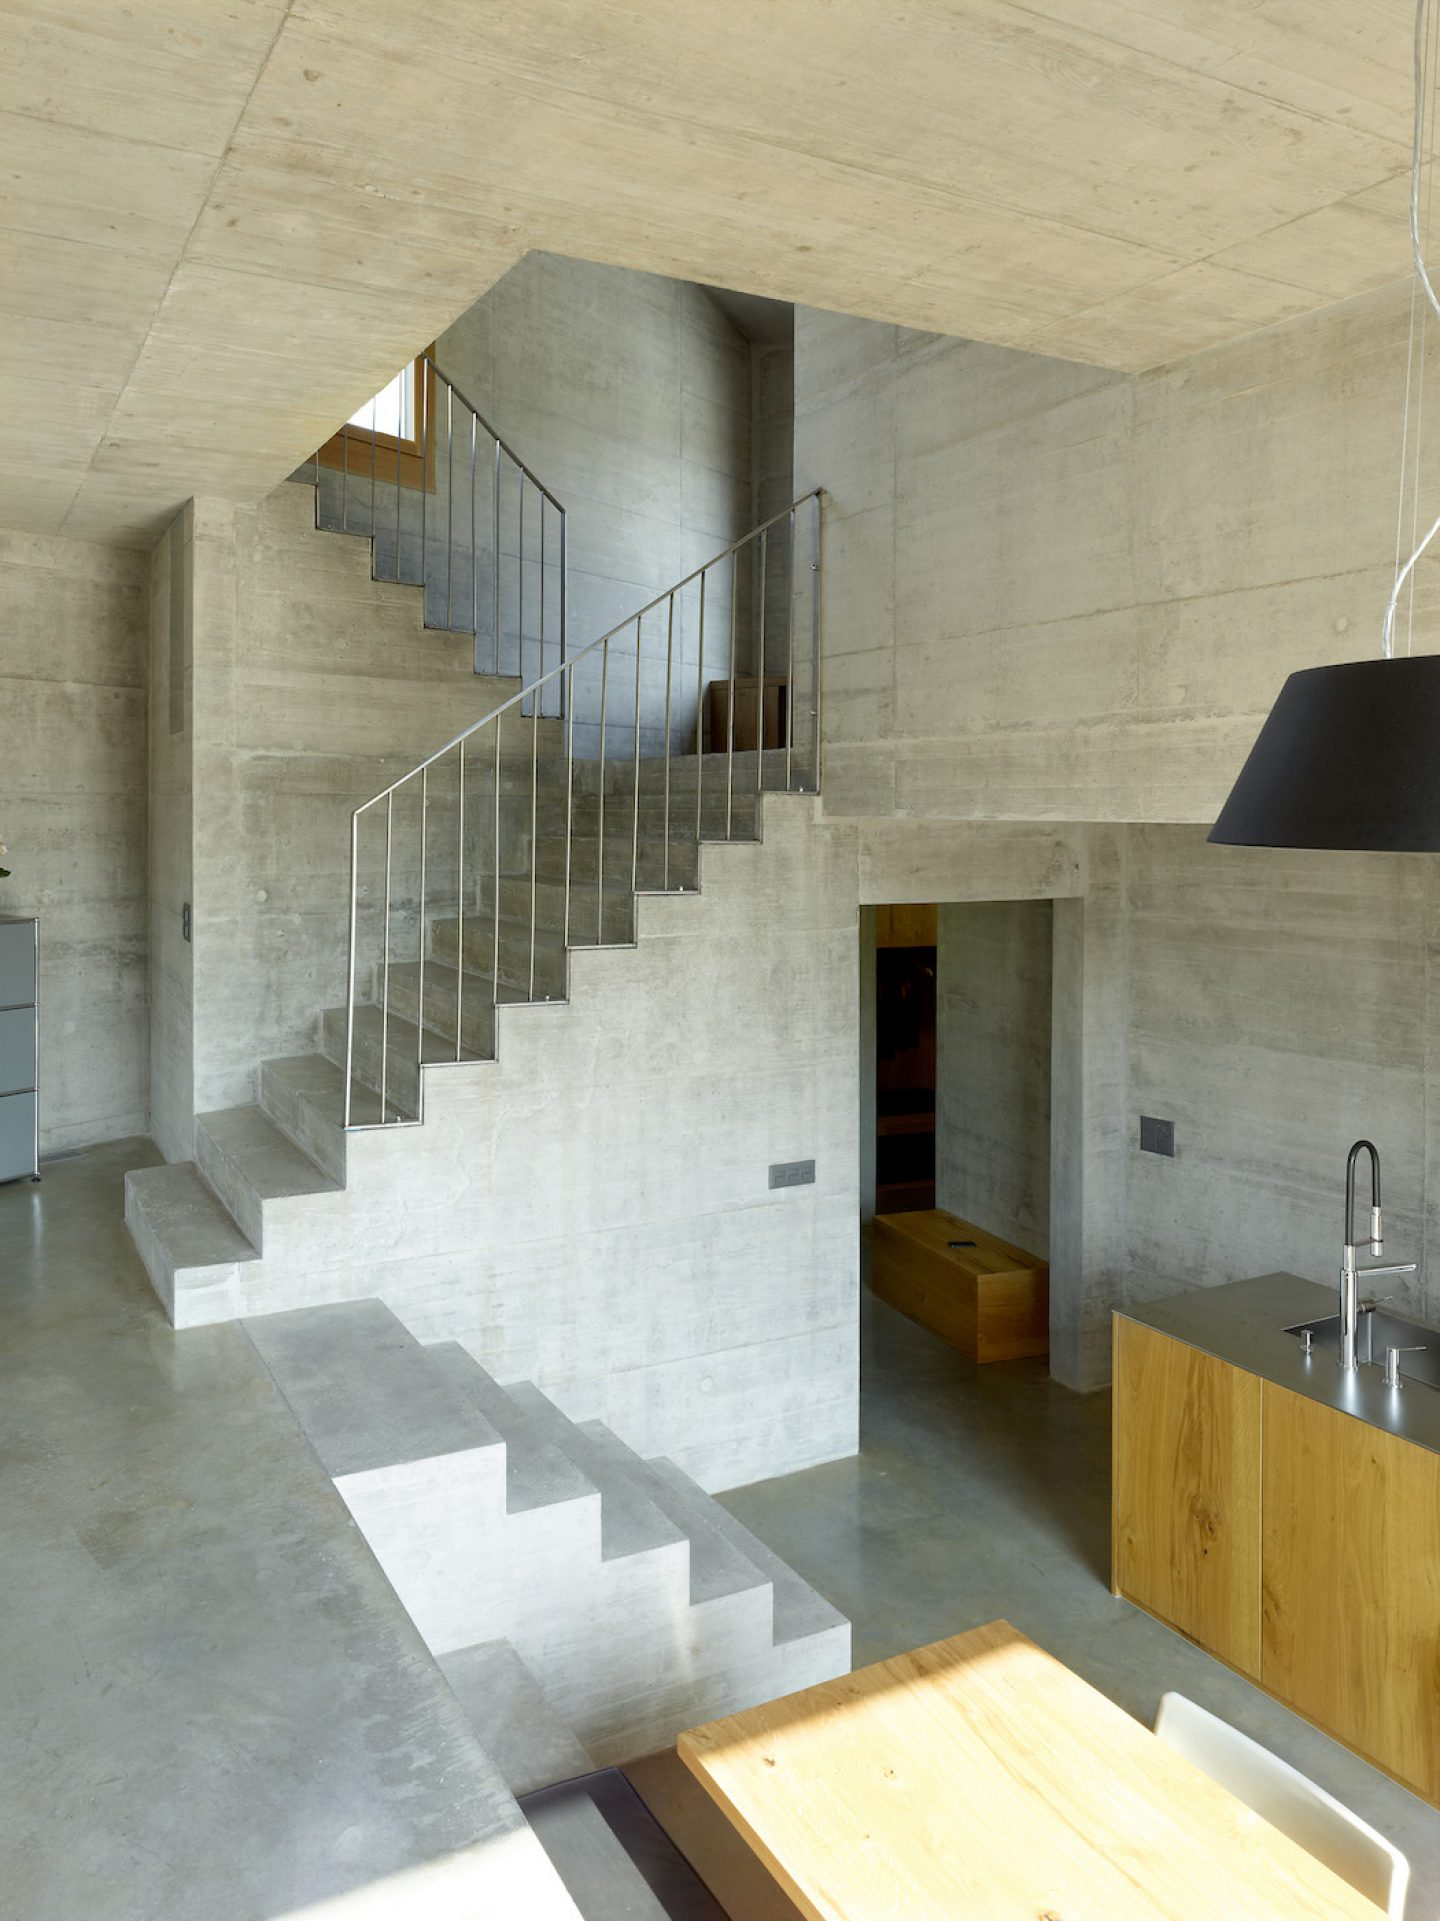 Savioz_Fabrizzi_Architecture_540